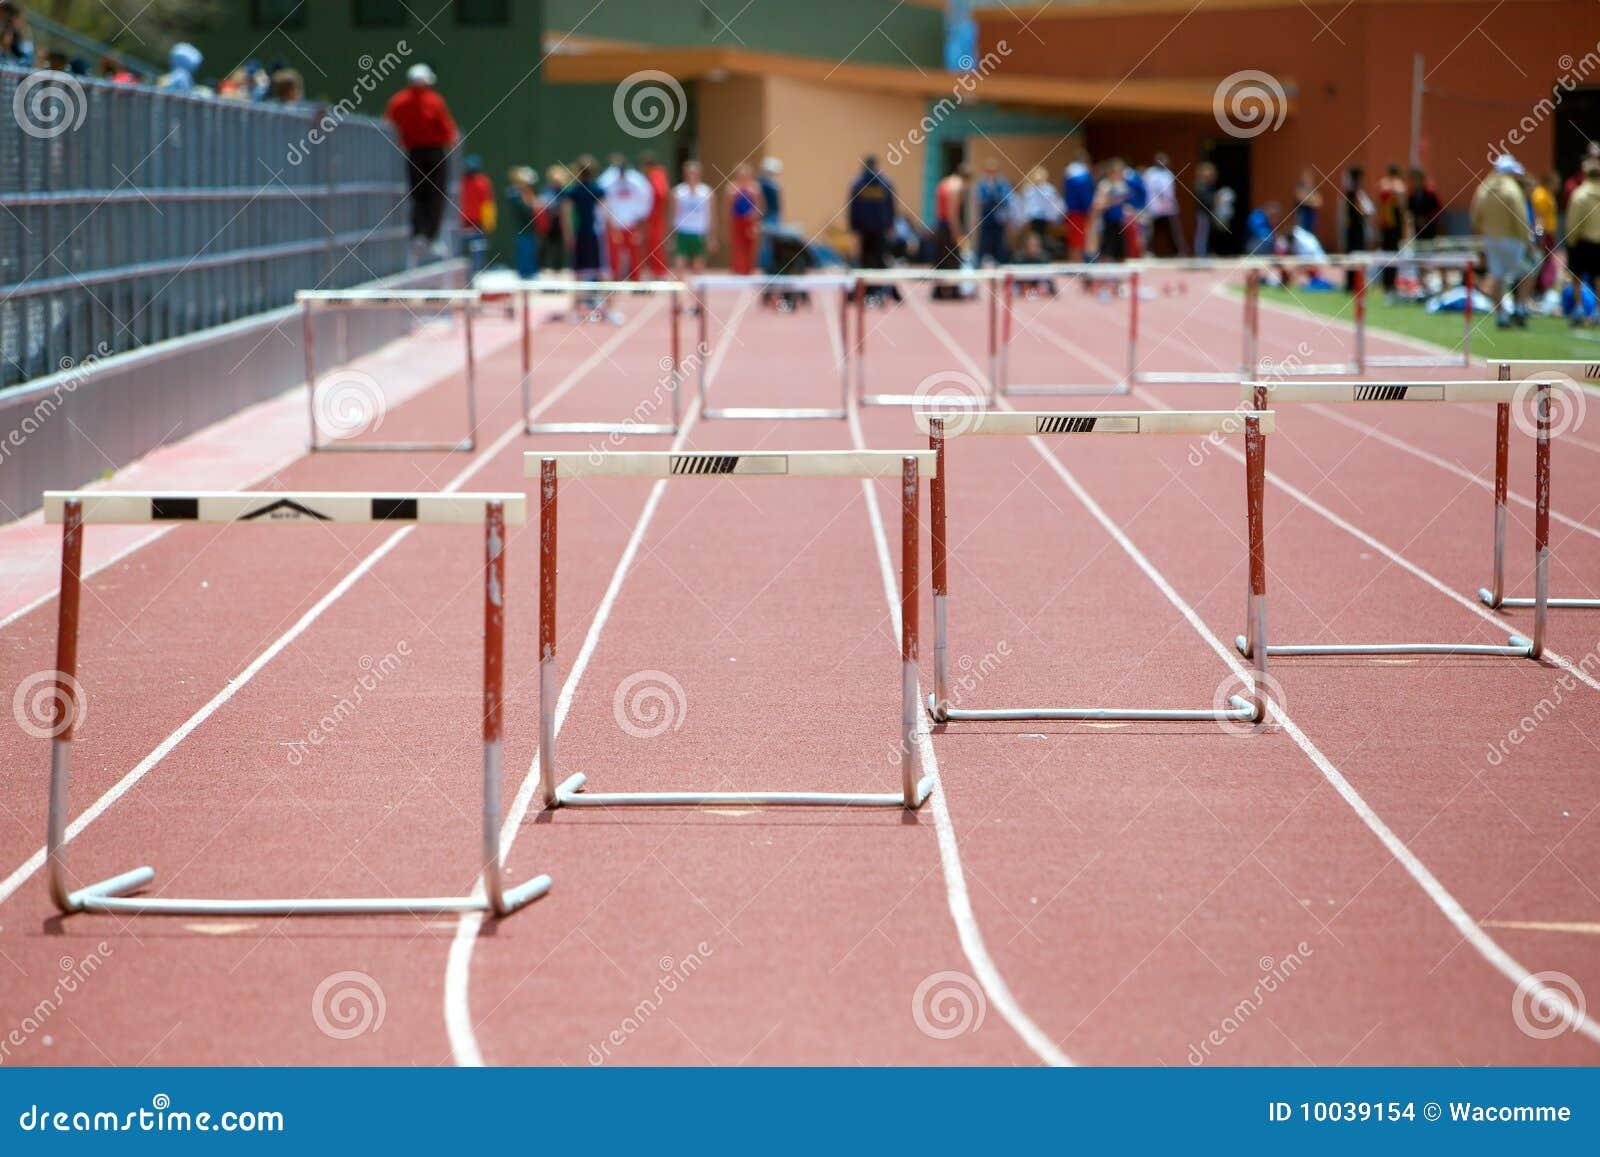 Preparing For A Hurdles Race Stock Photo